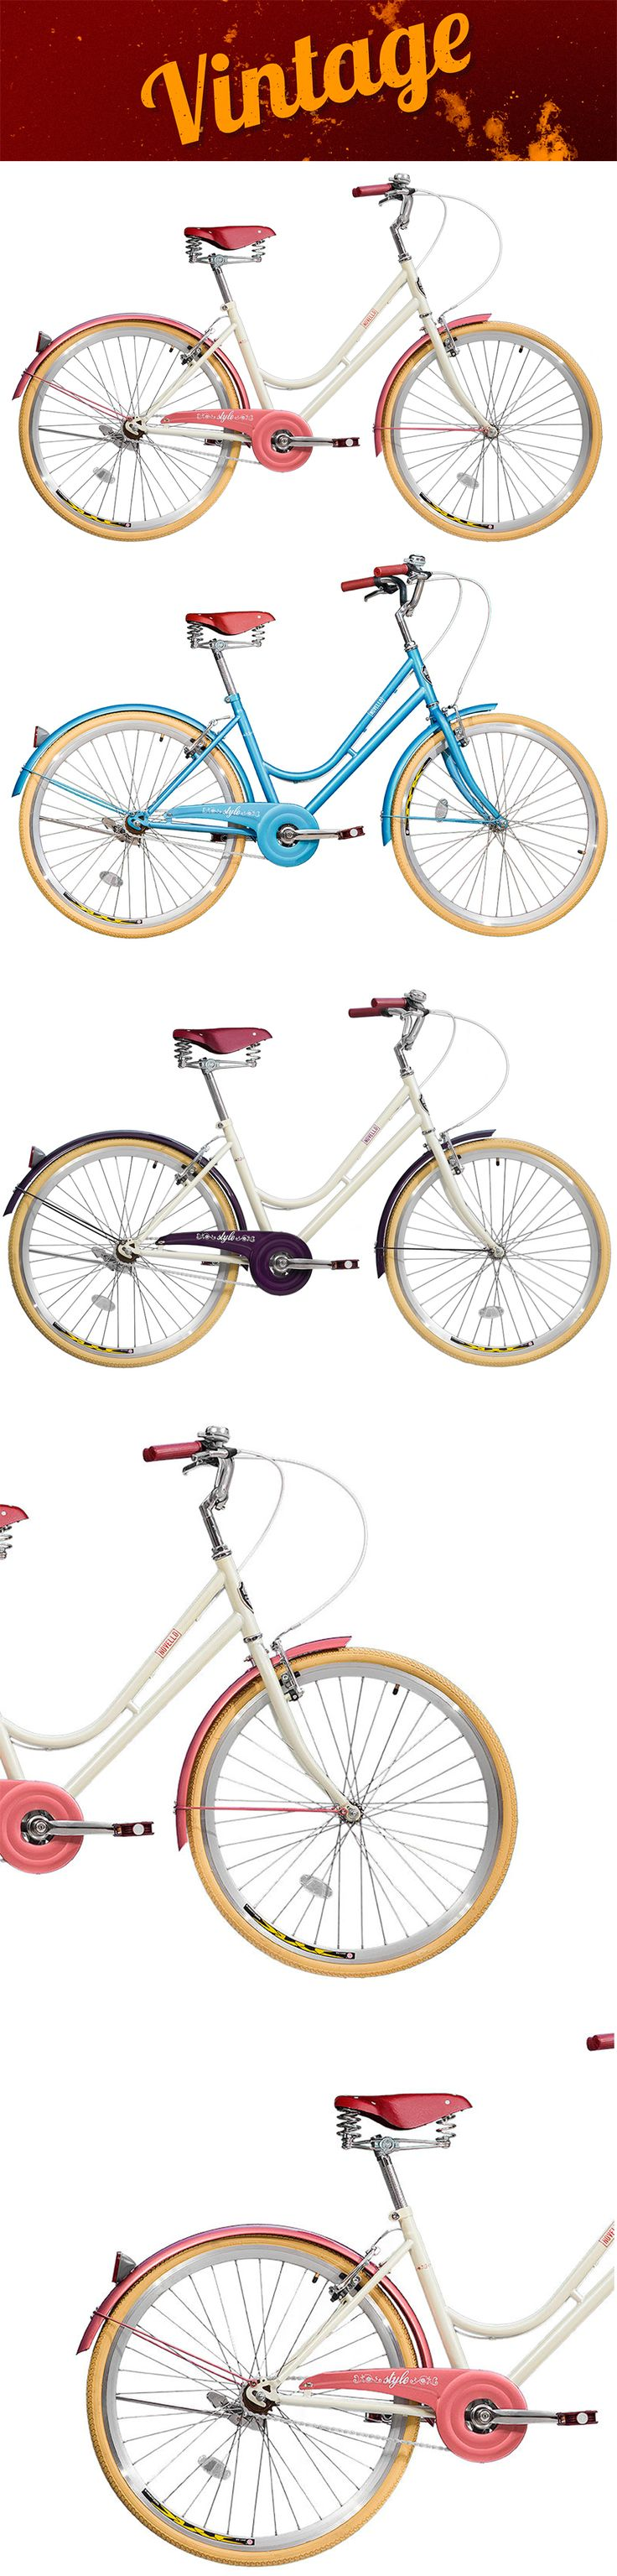 Bicicleta vintage blitz novello bike retrô